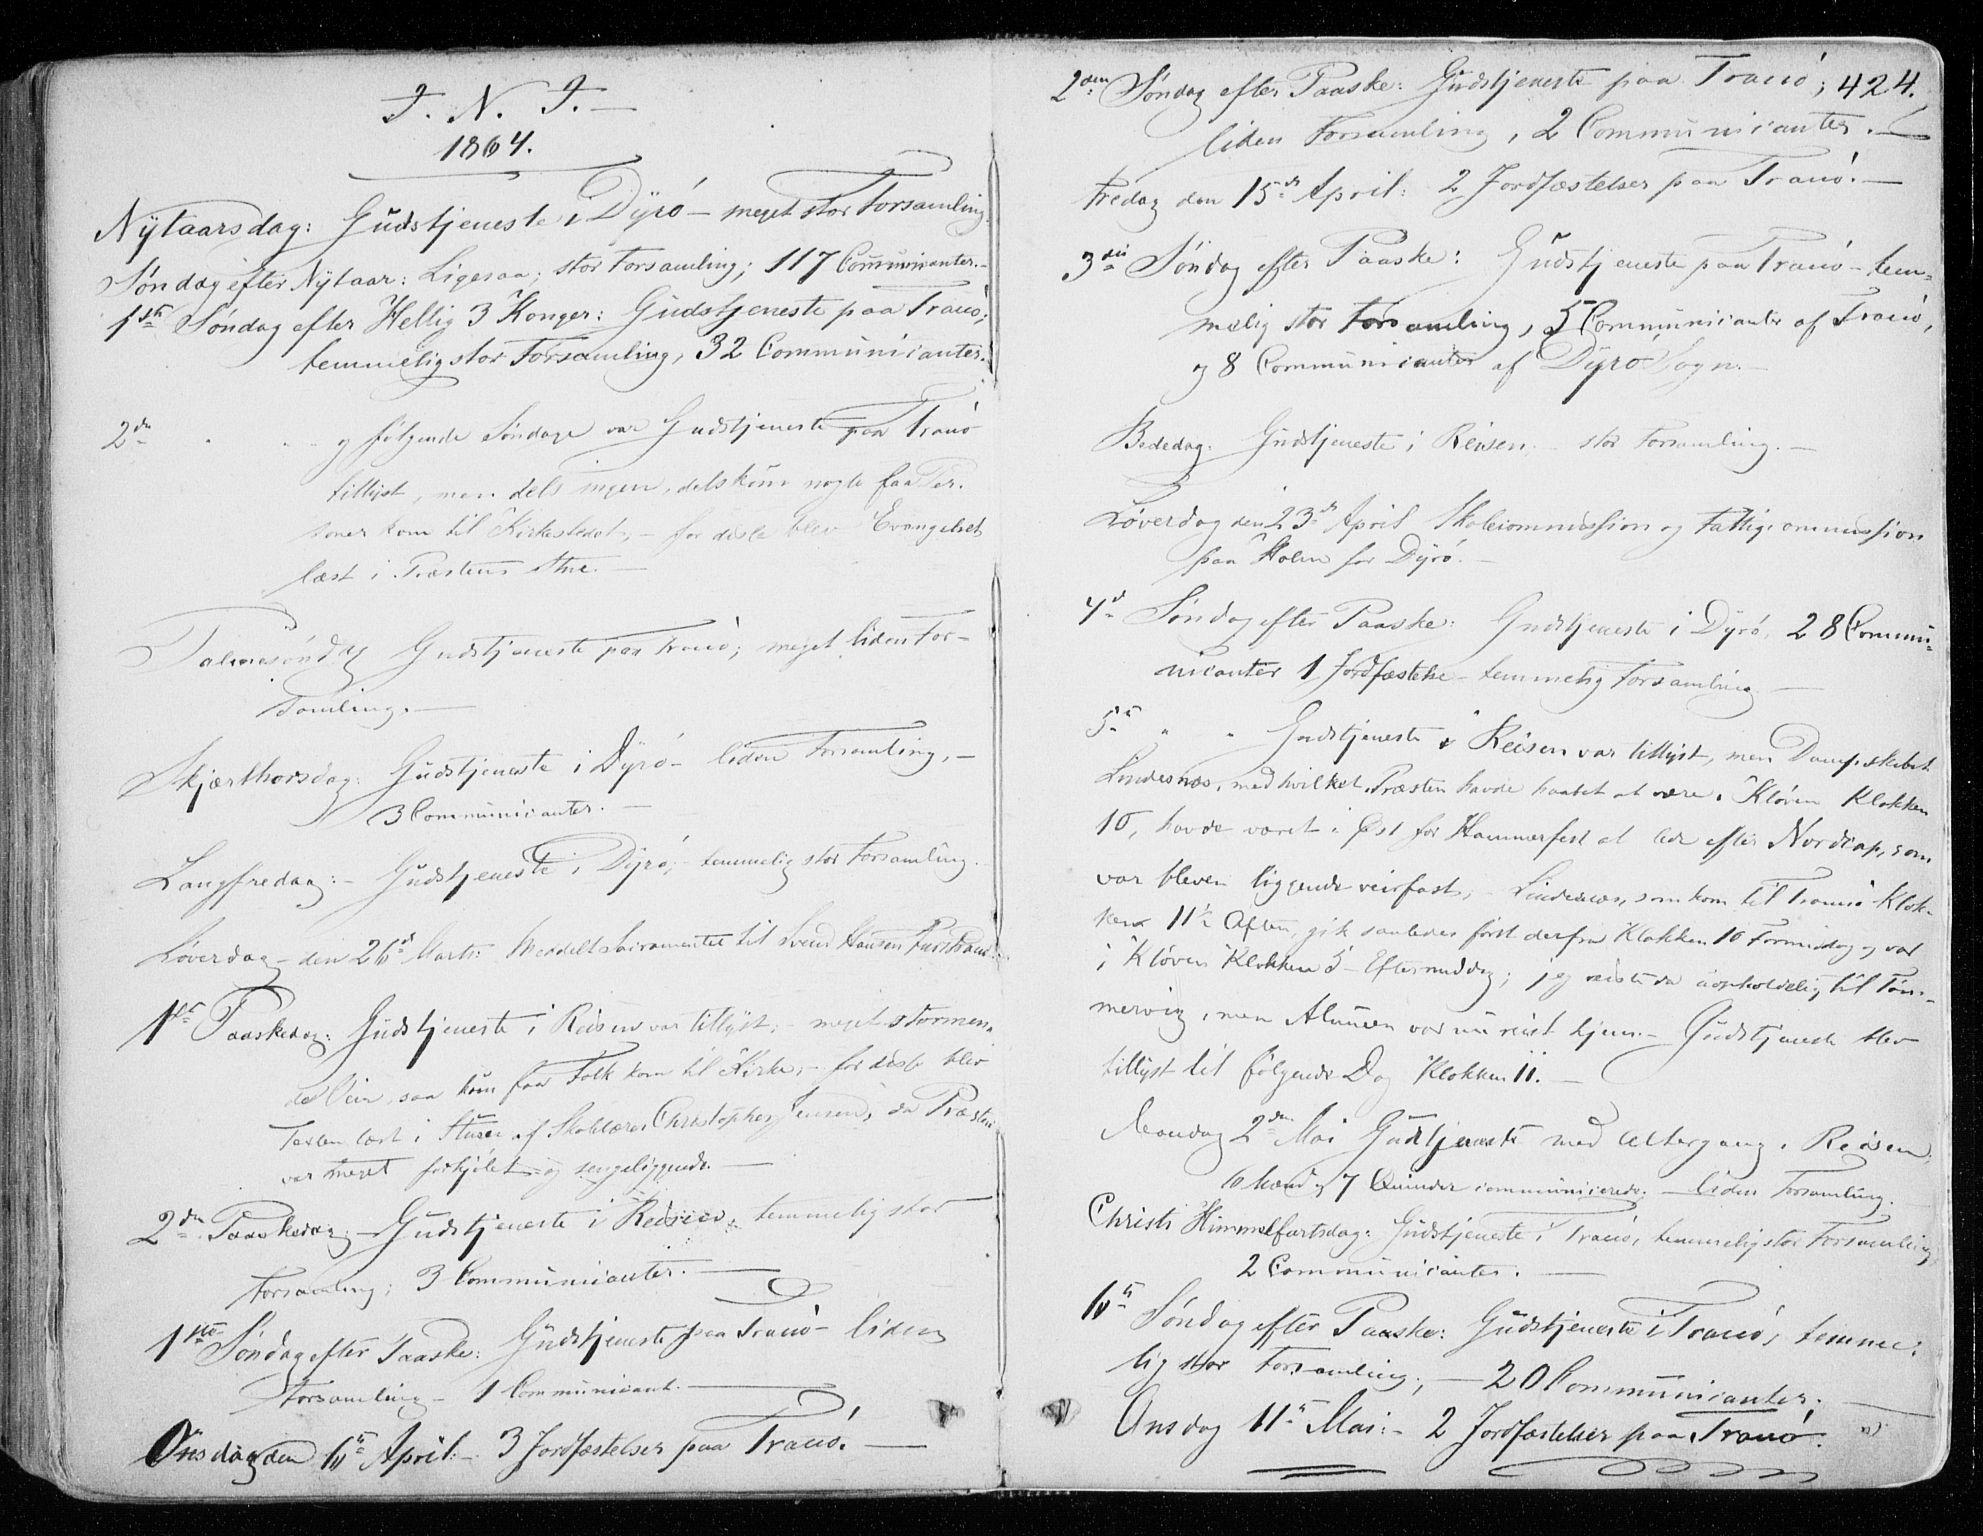 SATØ, Tranøy sokneprestkontor, I/Ia/Iaa/L0007kirke: Ministerialbok nr. 7, 1856-1866, s. 424